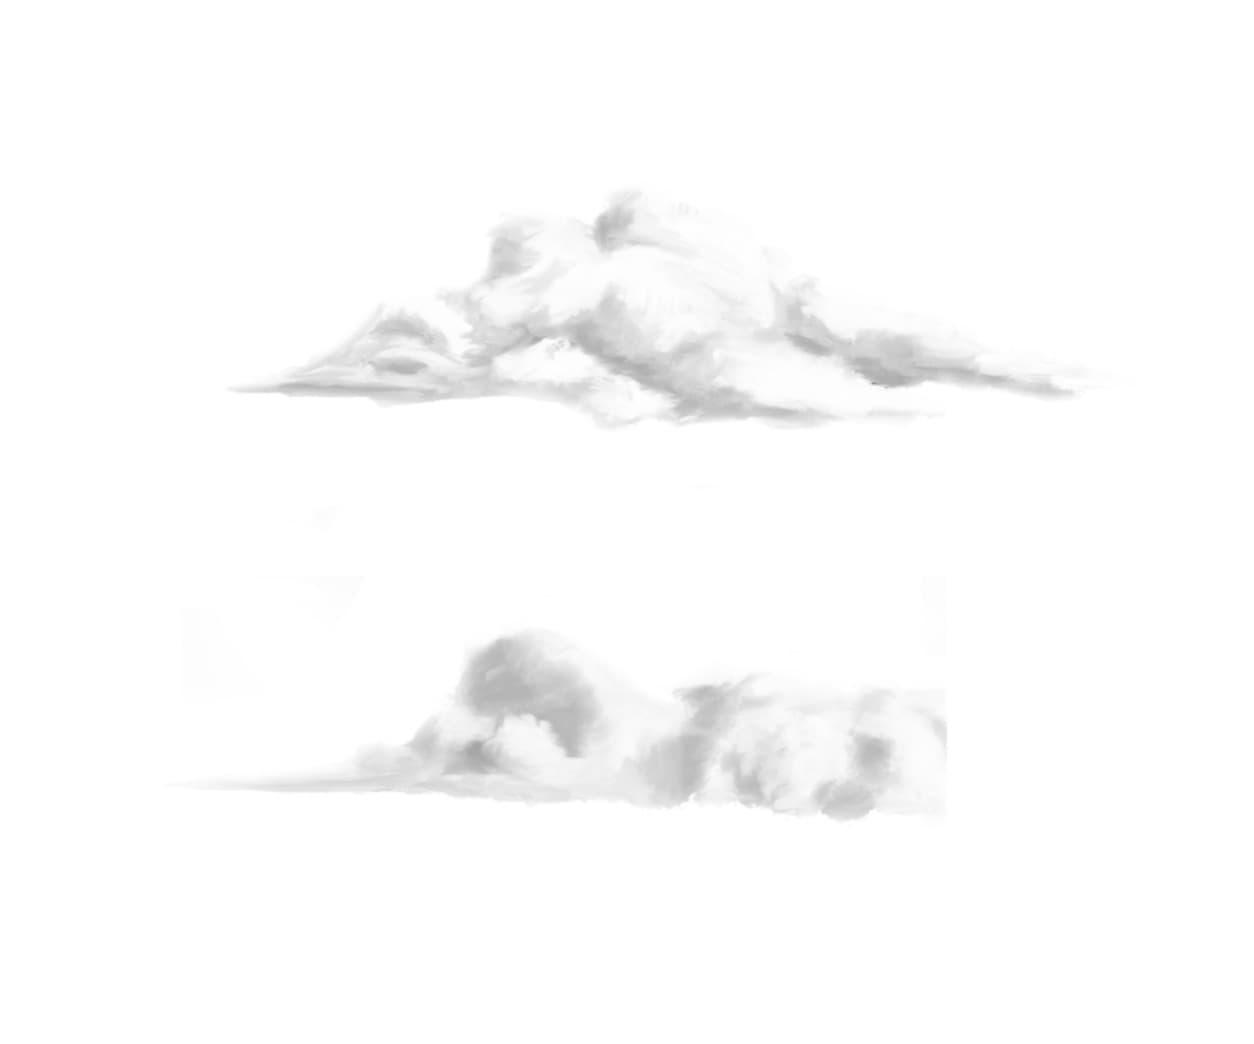 CleanShot-2021-05-08-at-22.25.37@2x-pichi